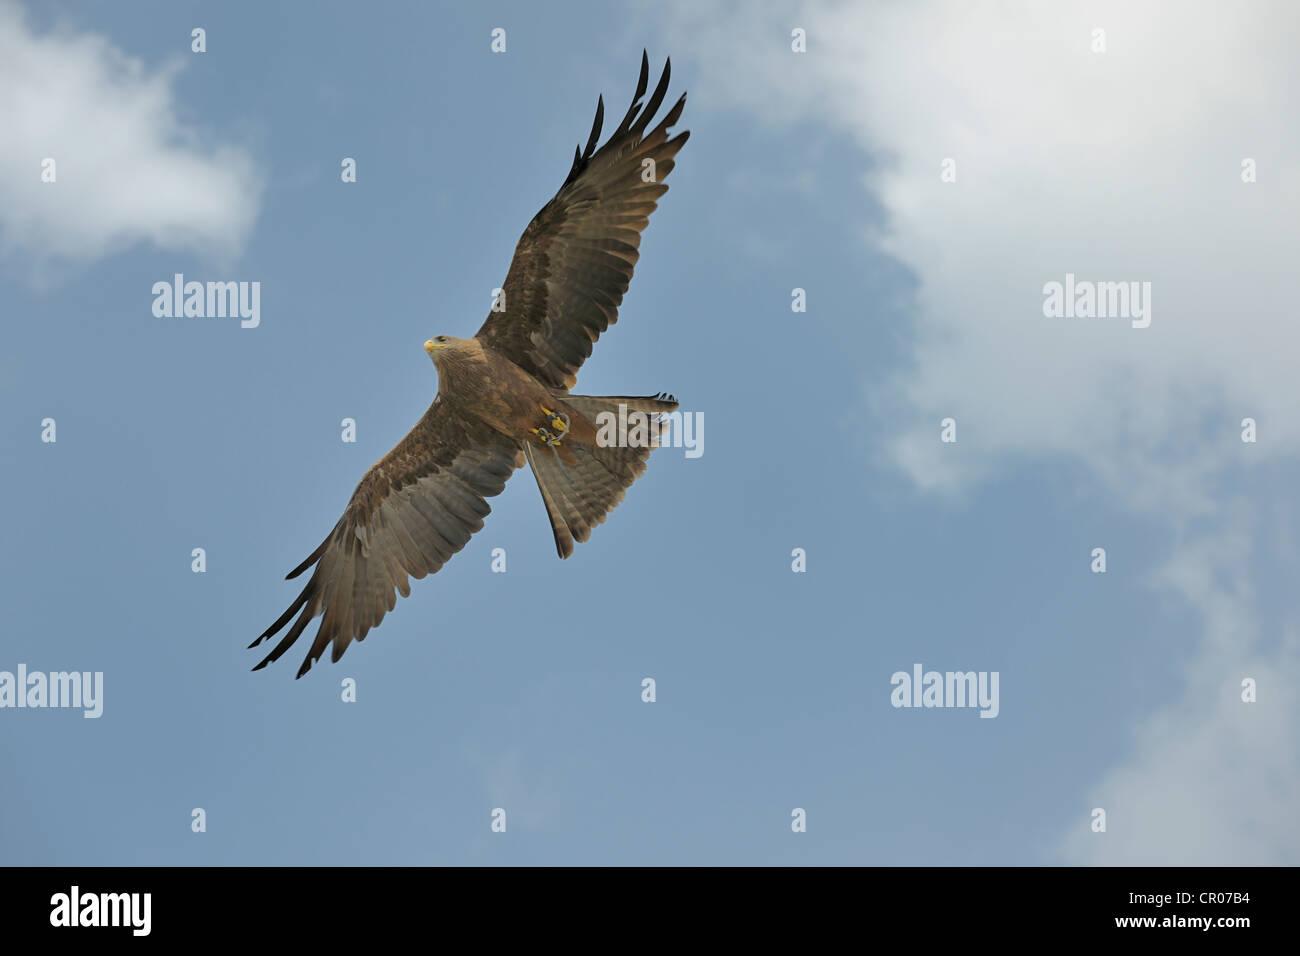 Black kite (Milvus migrans), Landskron Castle, an ornithological station for raptorial birds, Carinthia, Austria, - Stock Image